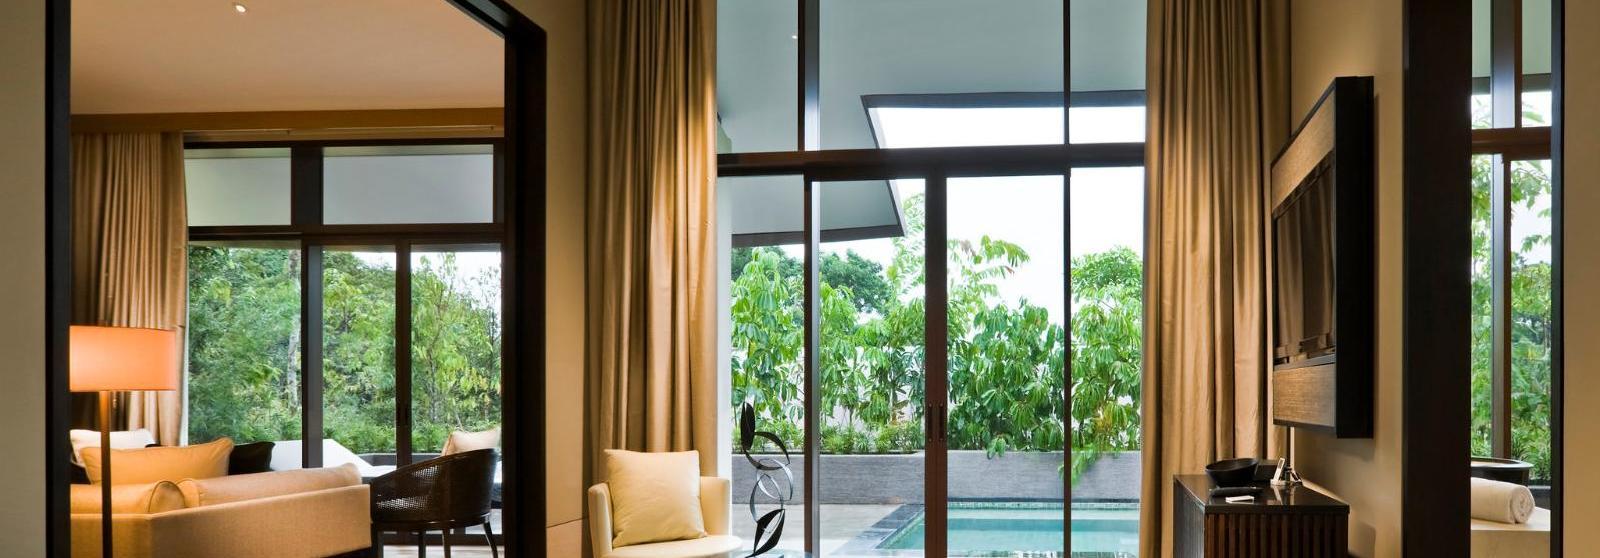 新加坡嘉佩乐酒店(Capella Singapore) 单卧别墅图片  www.lhw.cn